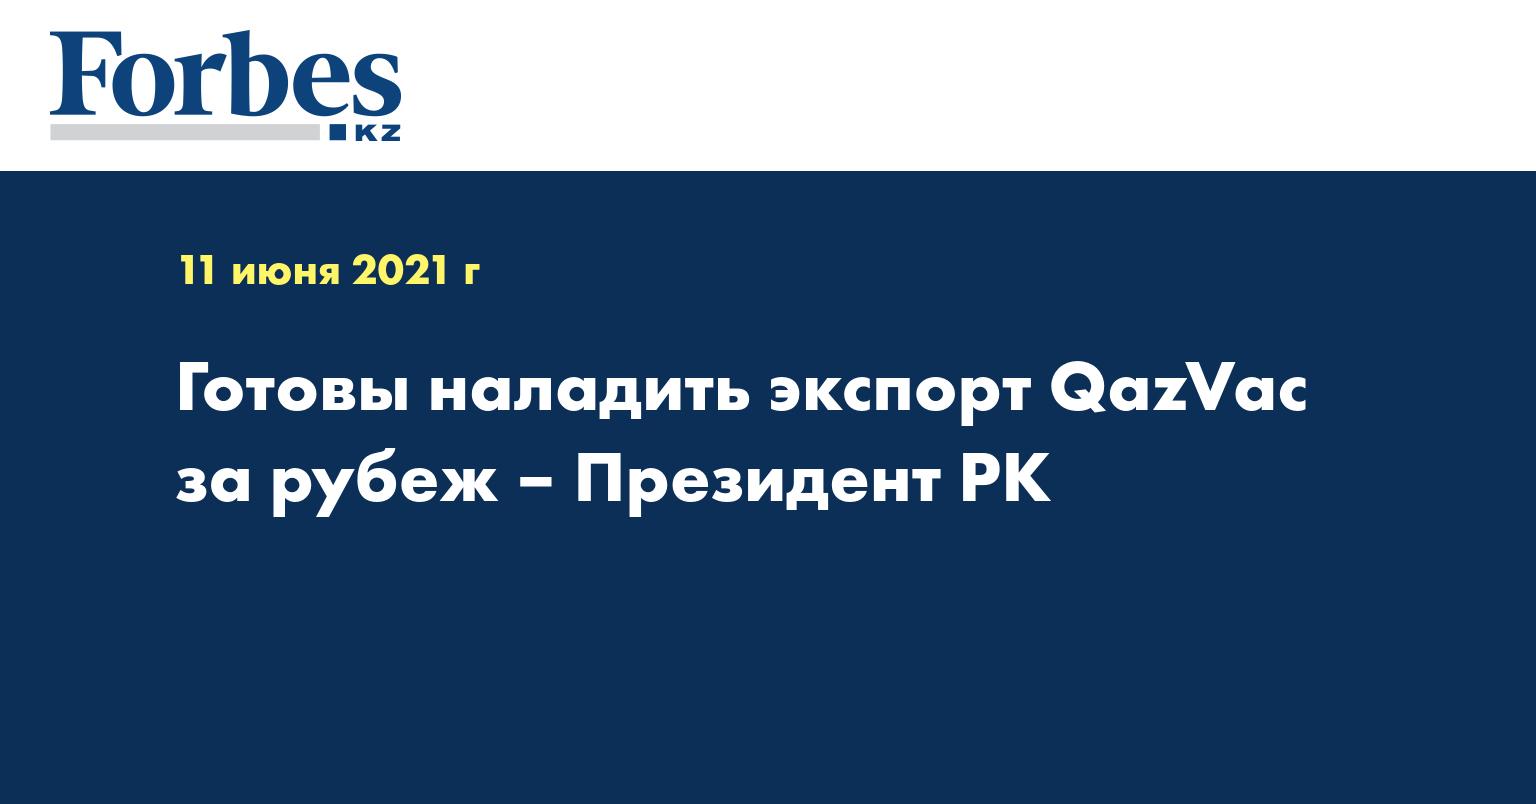 Готовы наладить экспорт QazVac за рубеж – Президент РК